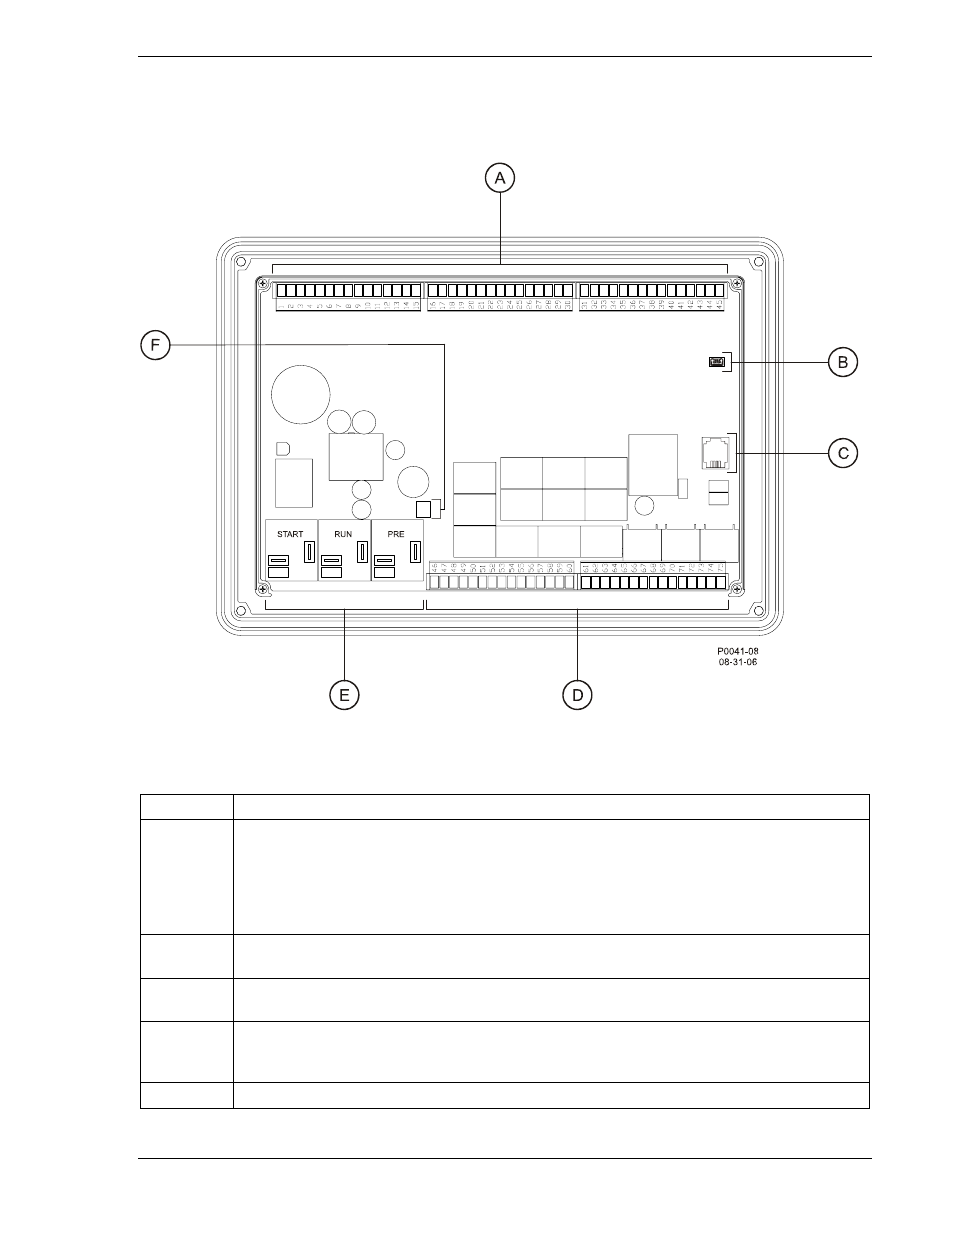 Rear Panel Figure 2 10 Dgc 2020 Hmi Table Usoc Cable Wiring Diagram Descriptions Winco User Manual Page 33 193